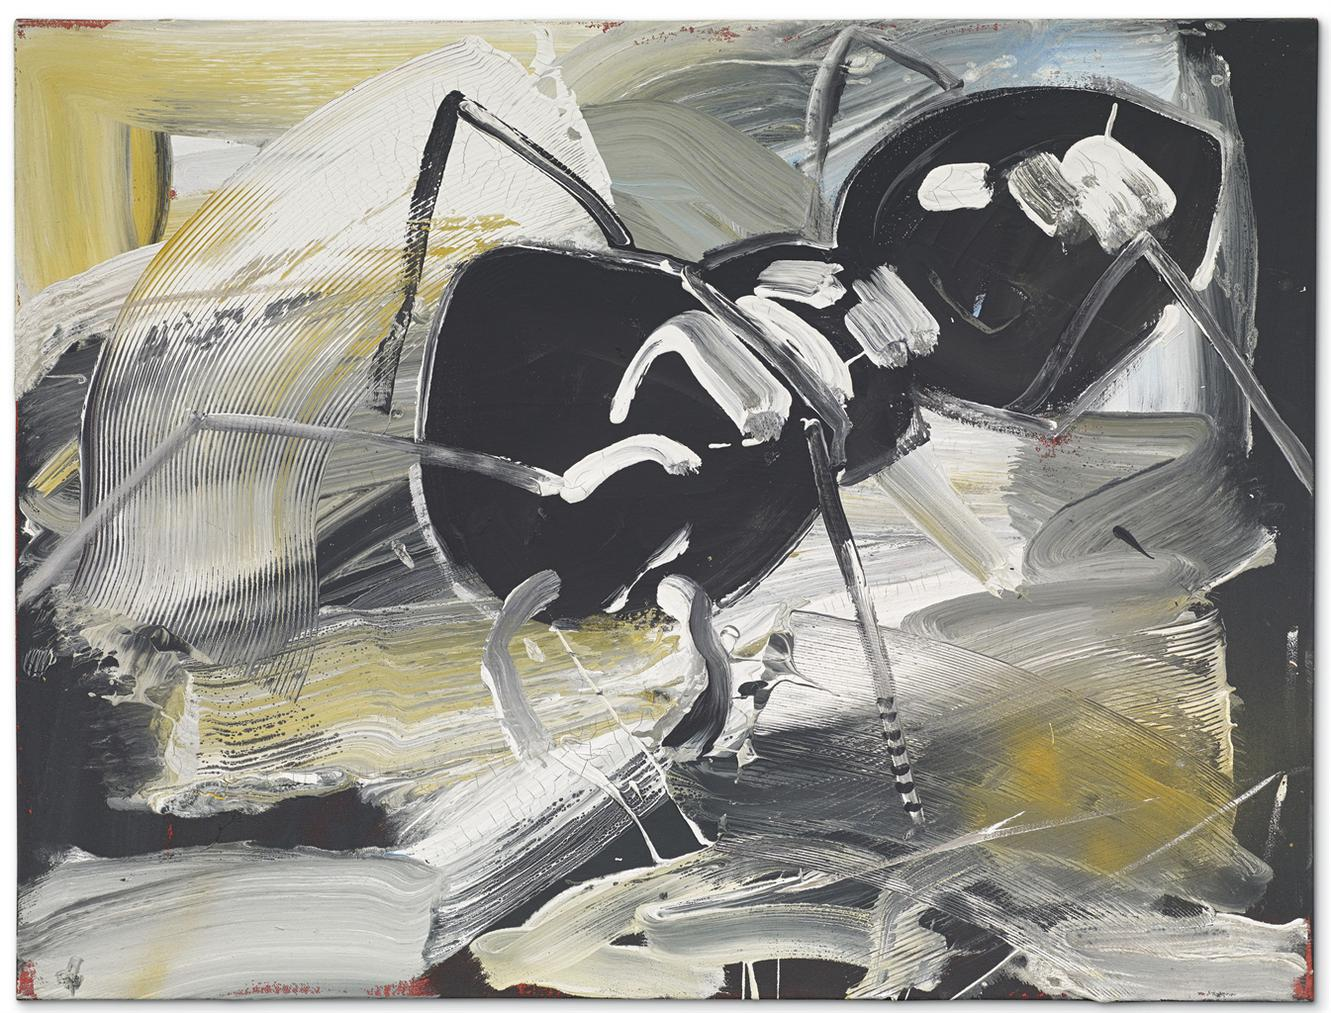 Albert Oehlen-Ameise (Ant)-1982